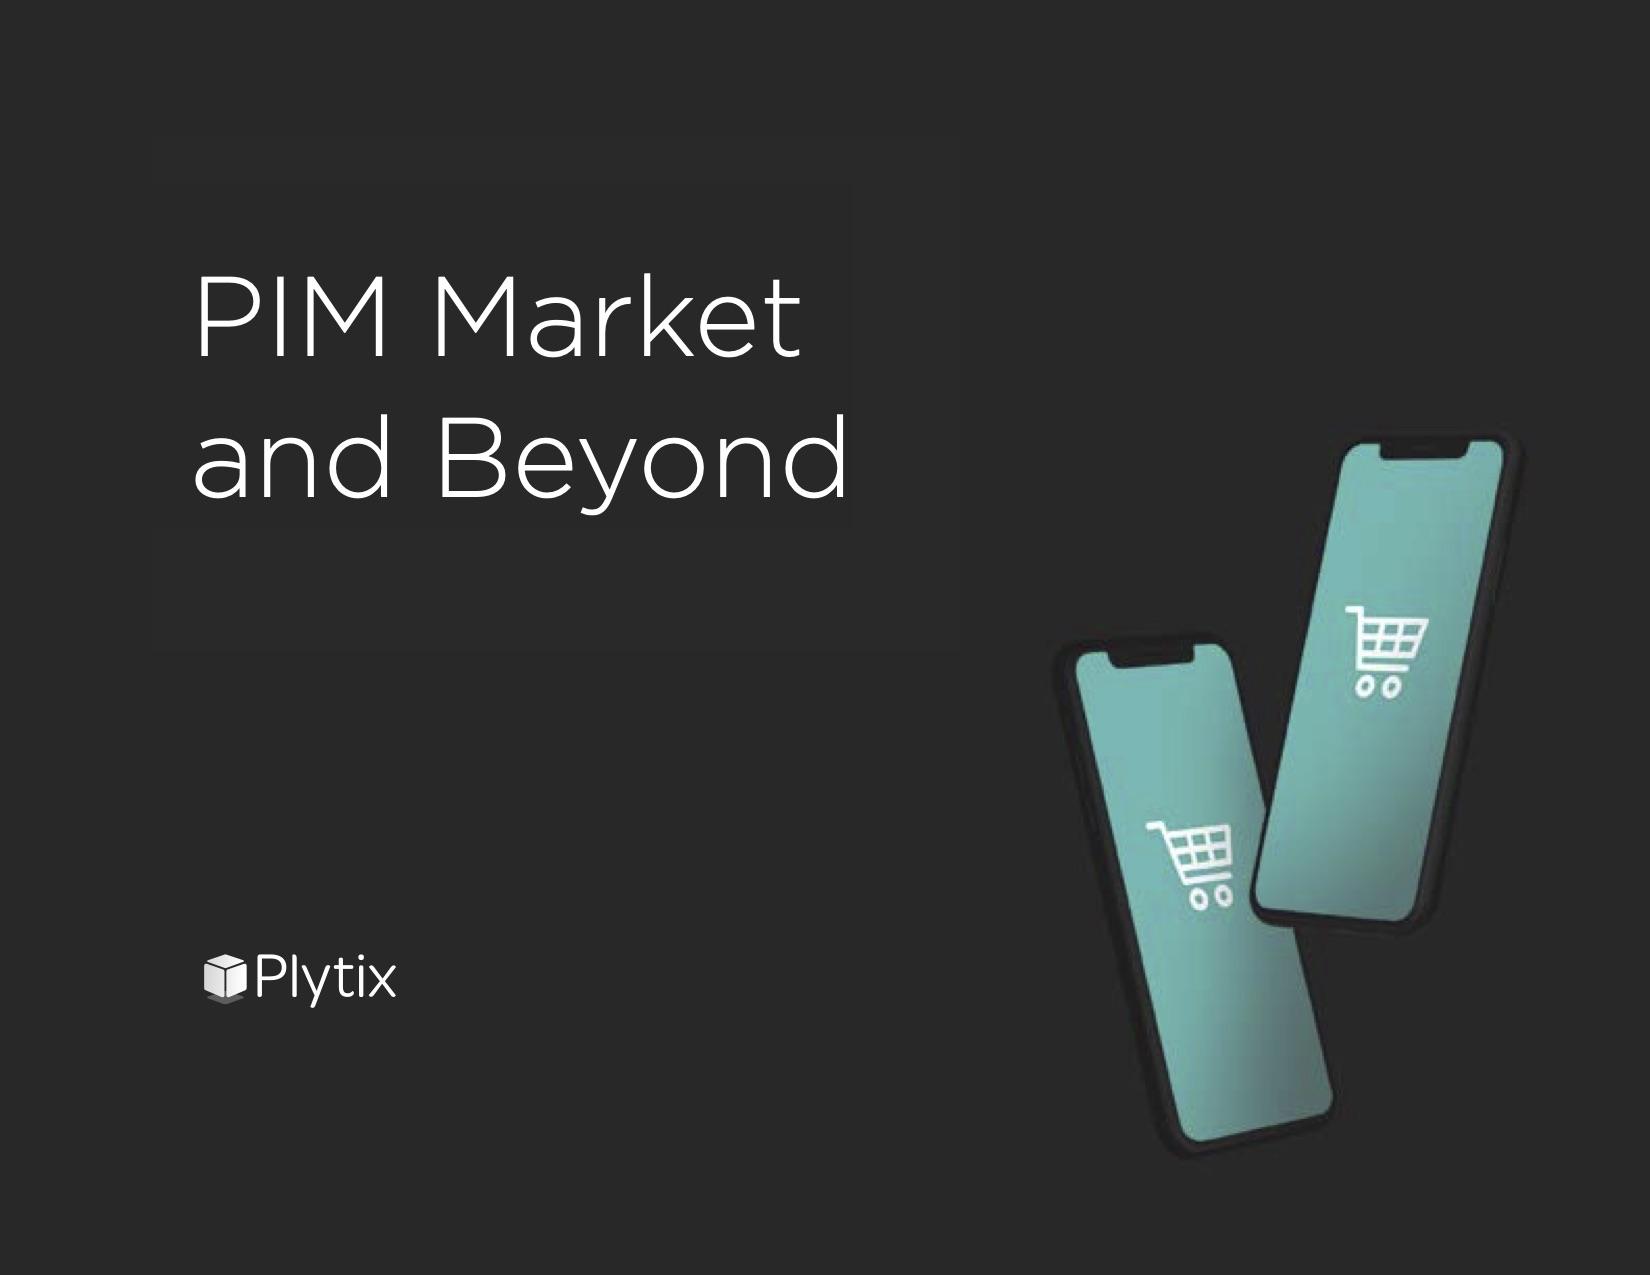 PIM Market and Beyond 2020